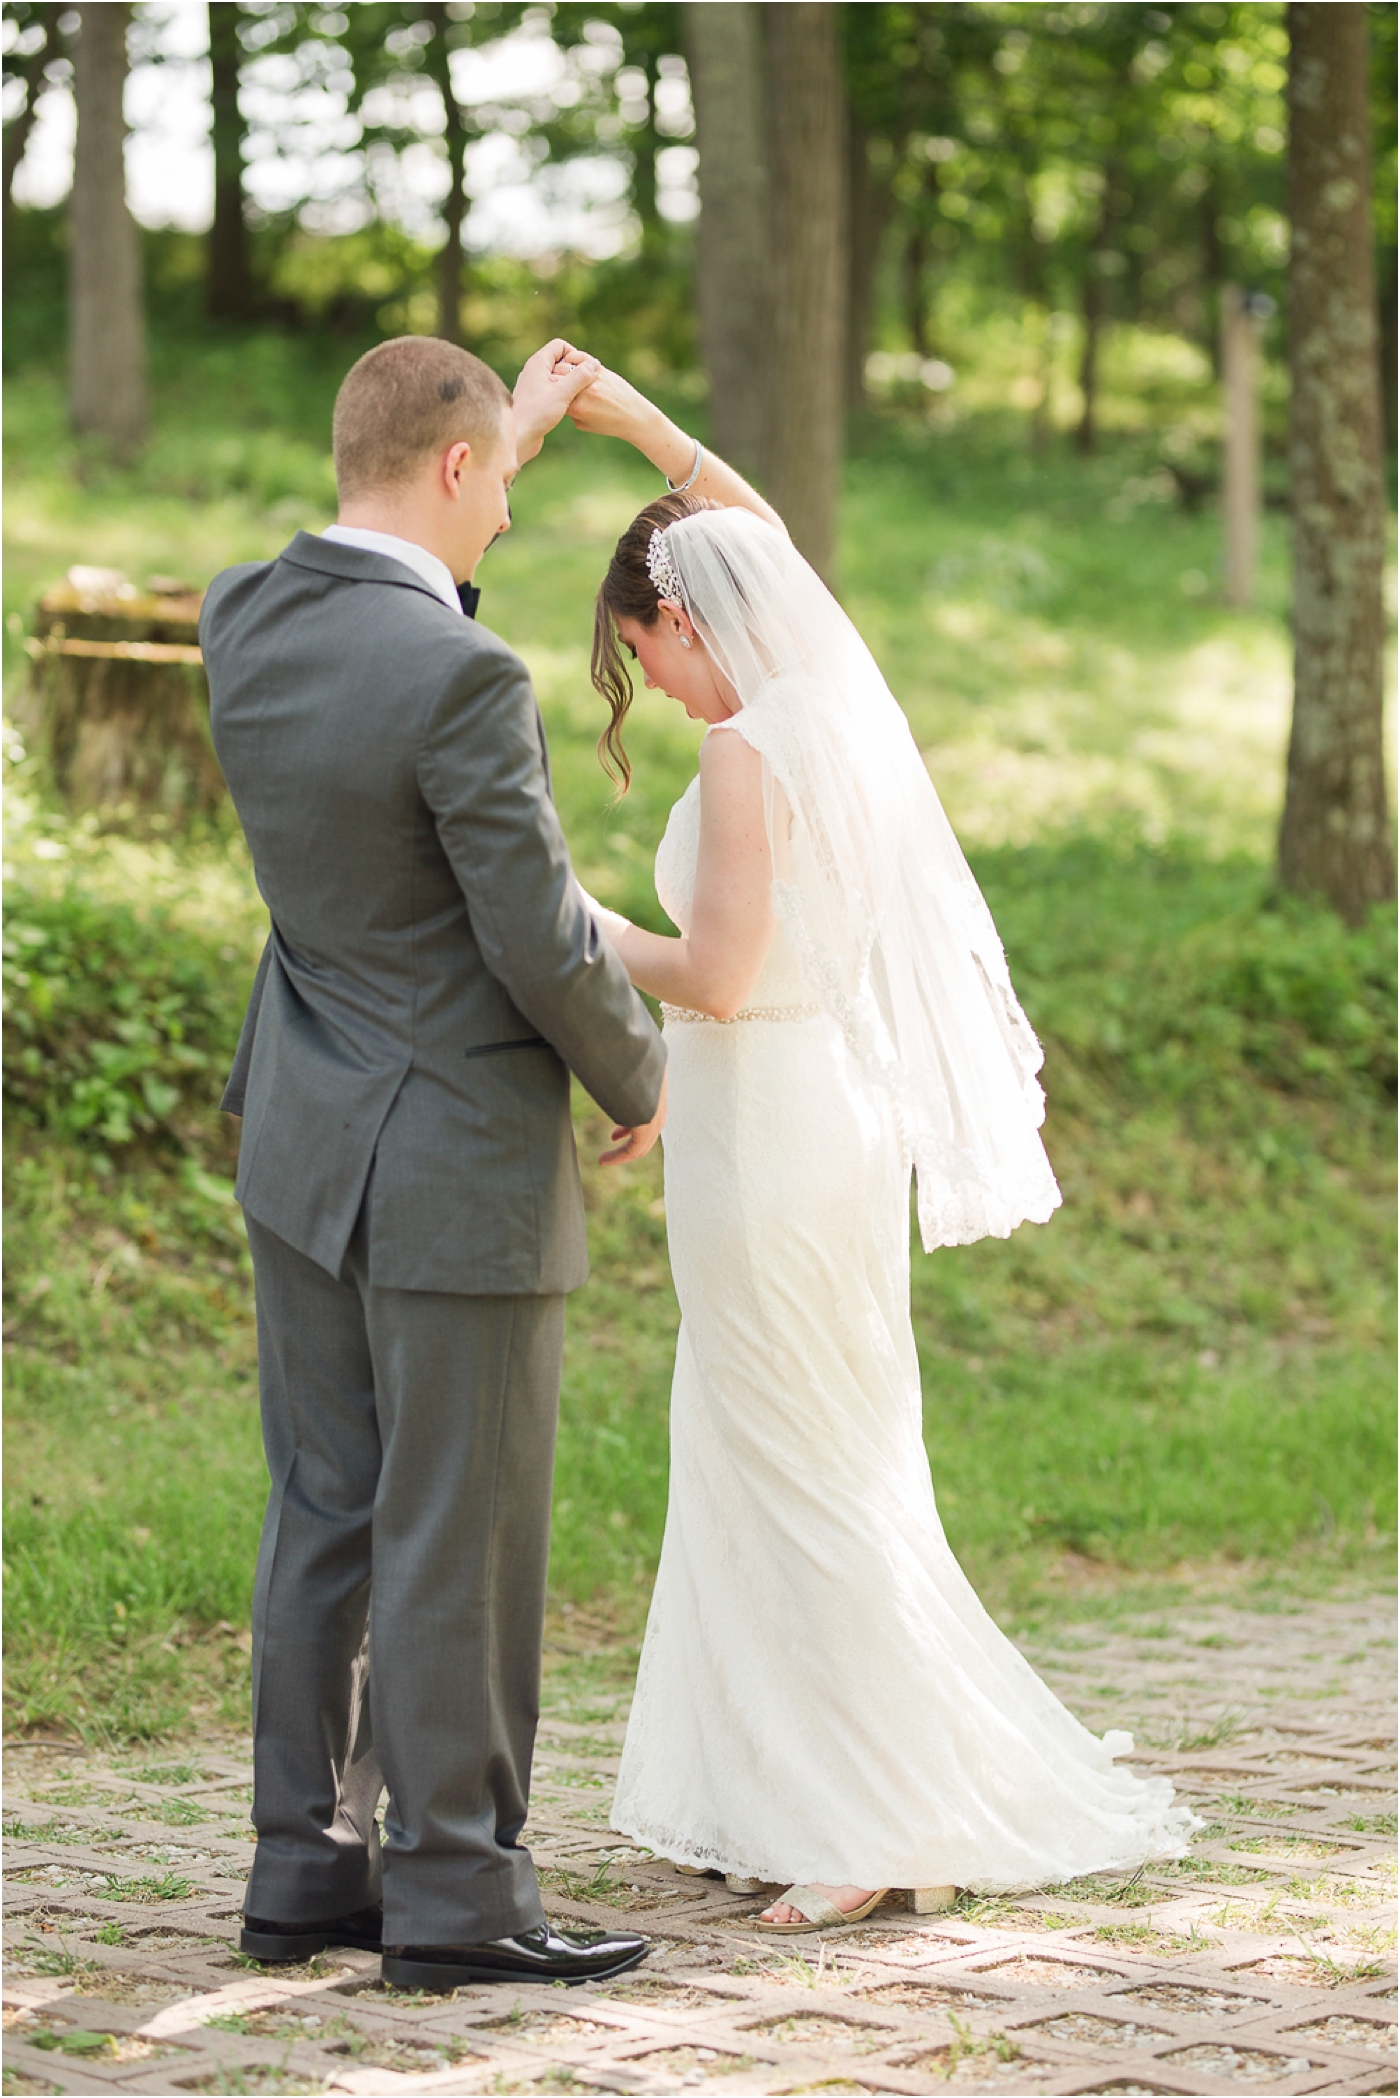 Gettysburg-lodges-wedding-photos-36.jpg